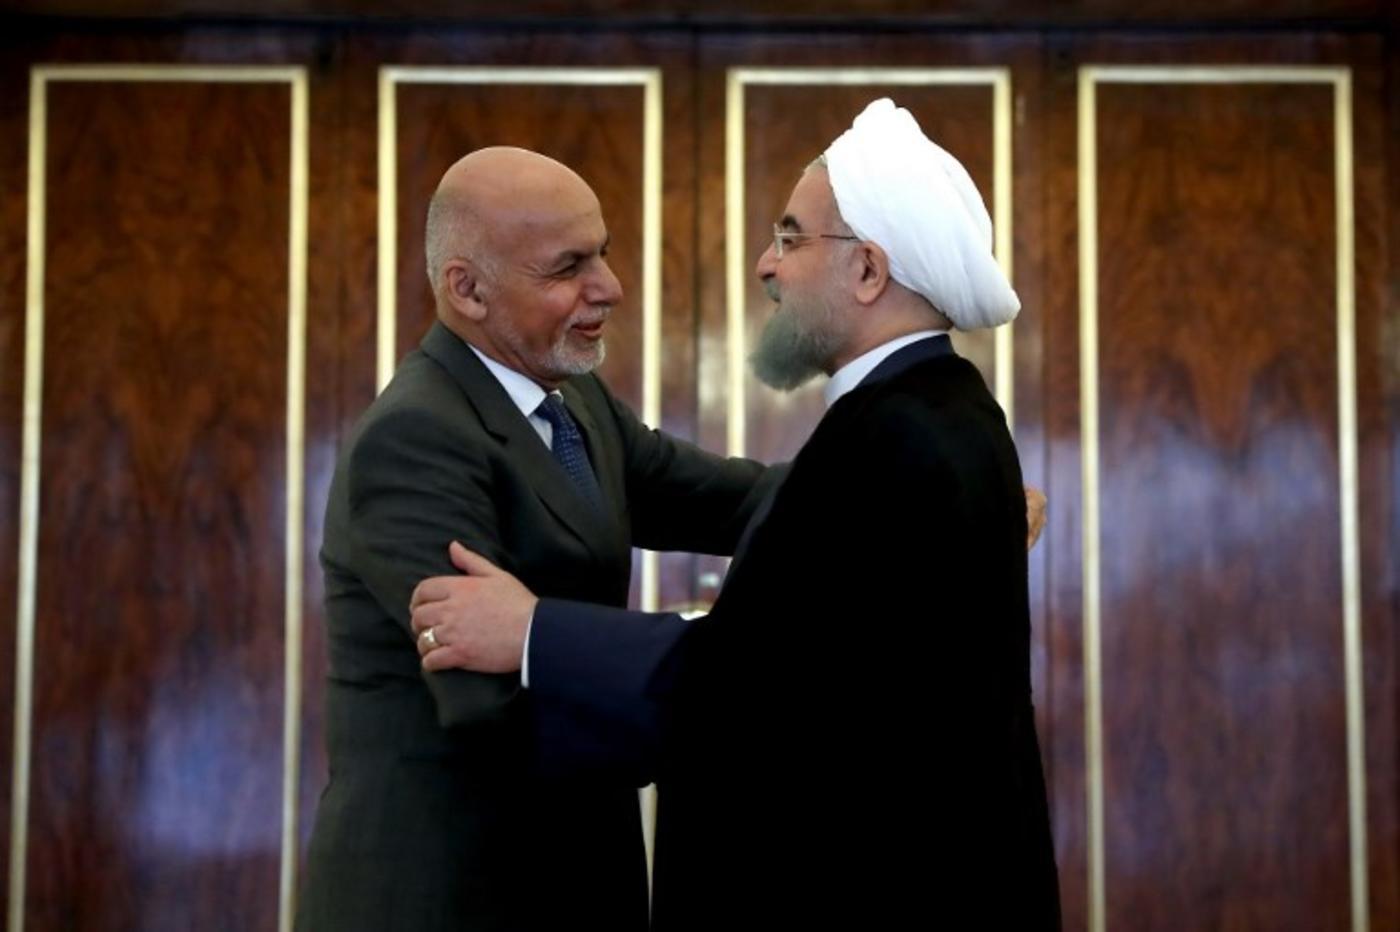 Advantage Tehran: Trump's Afghan strategy shift presents an